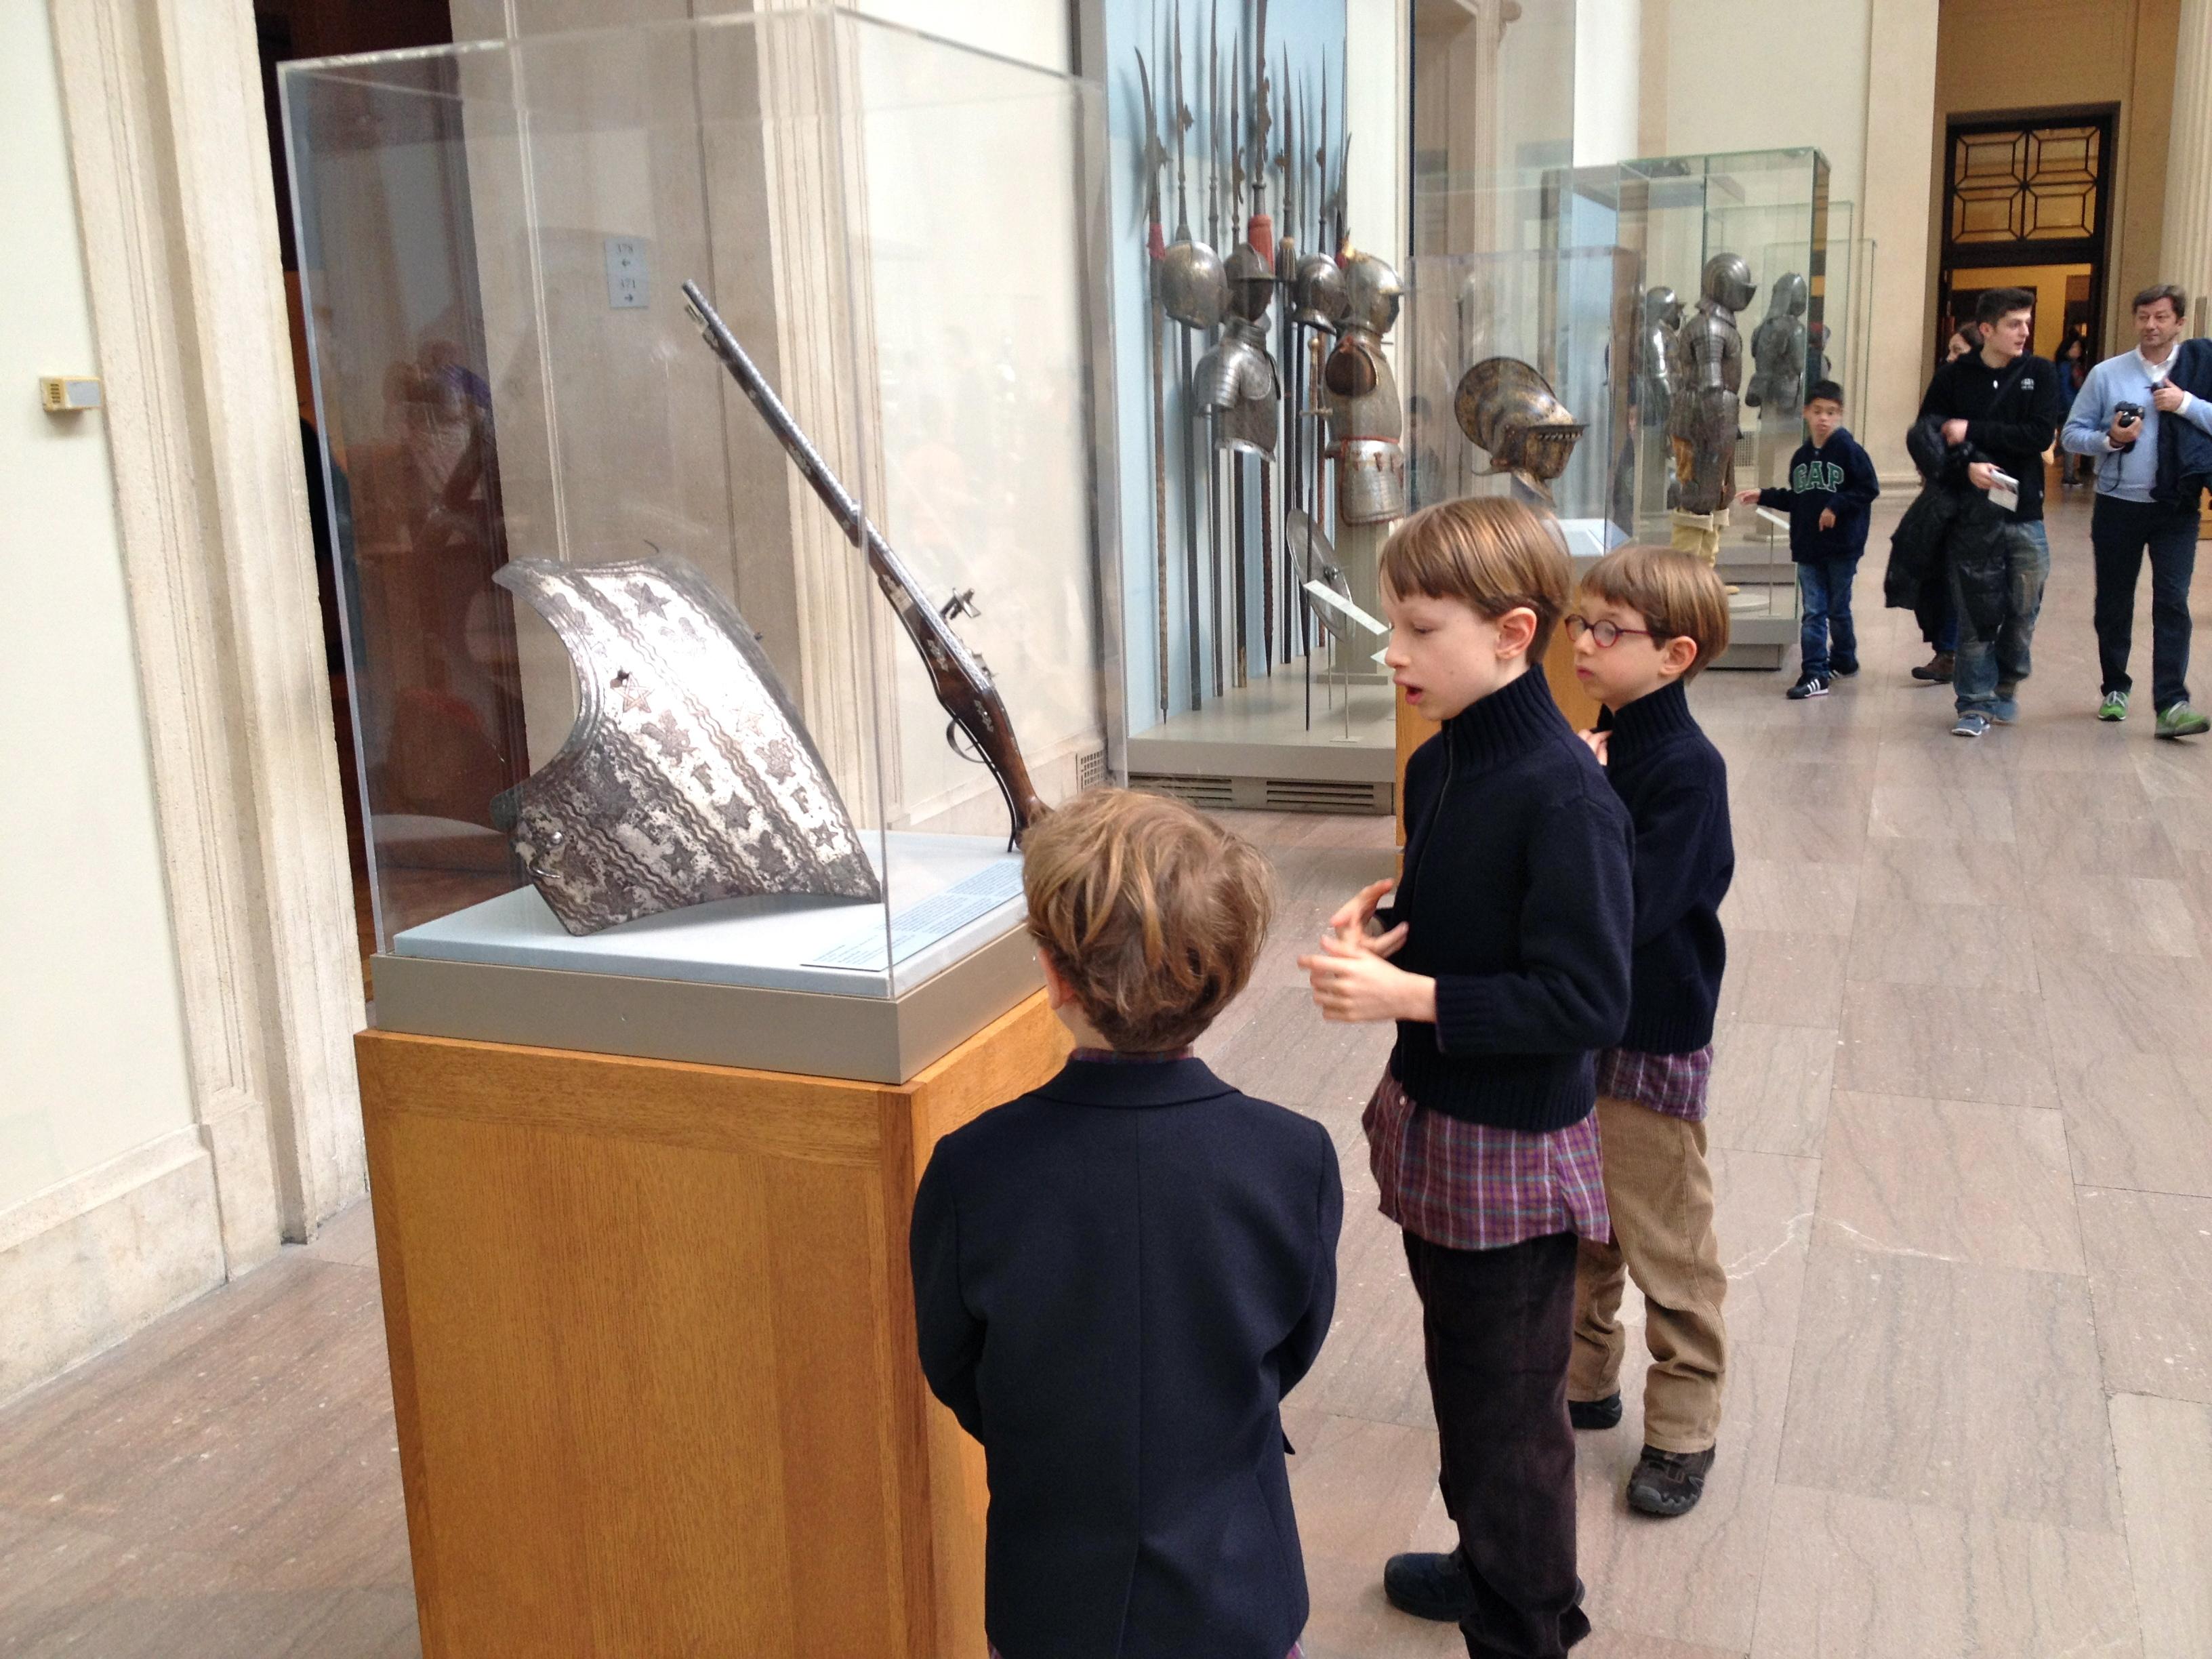 Boys admiring guns